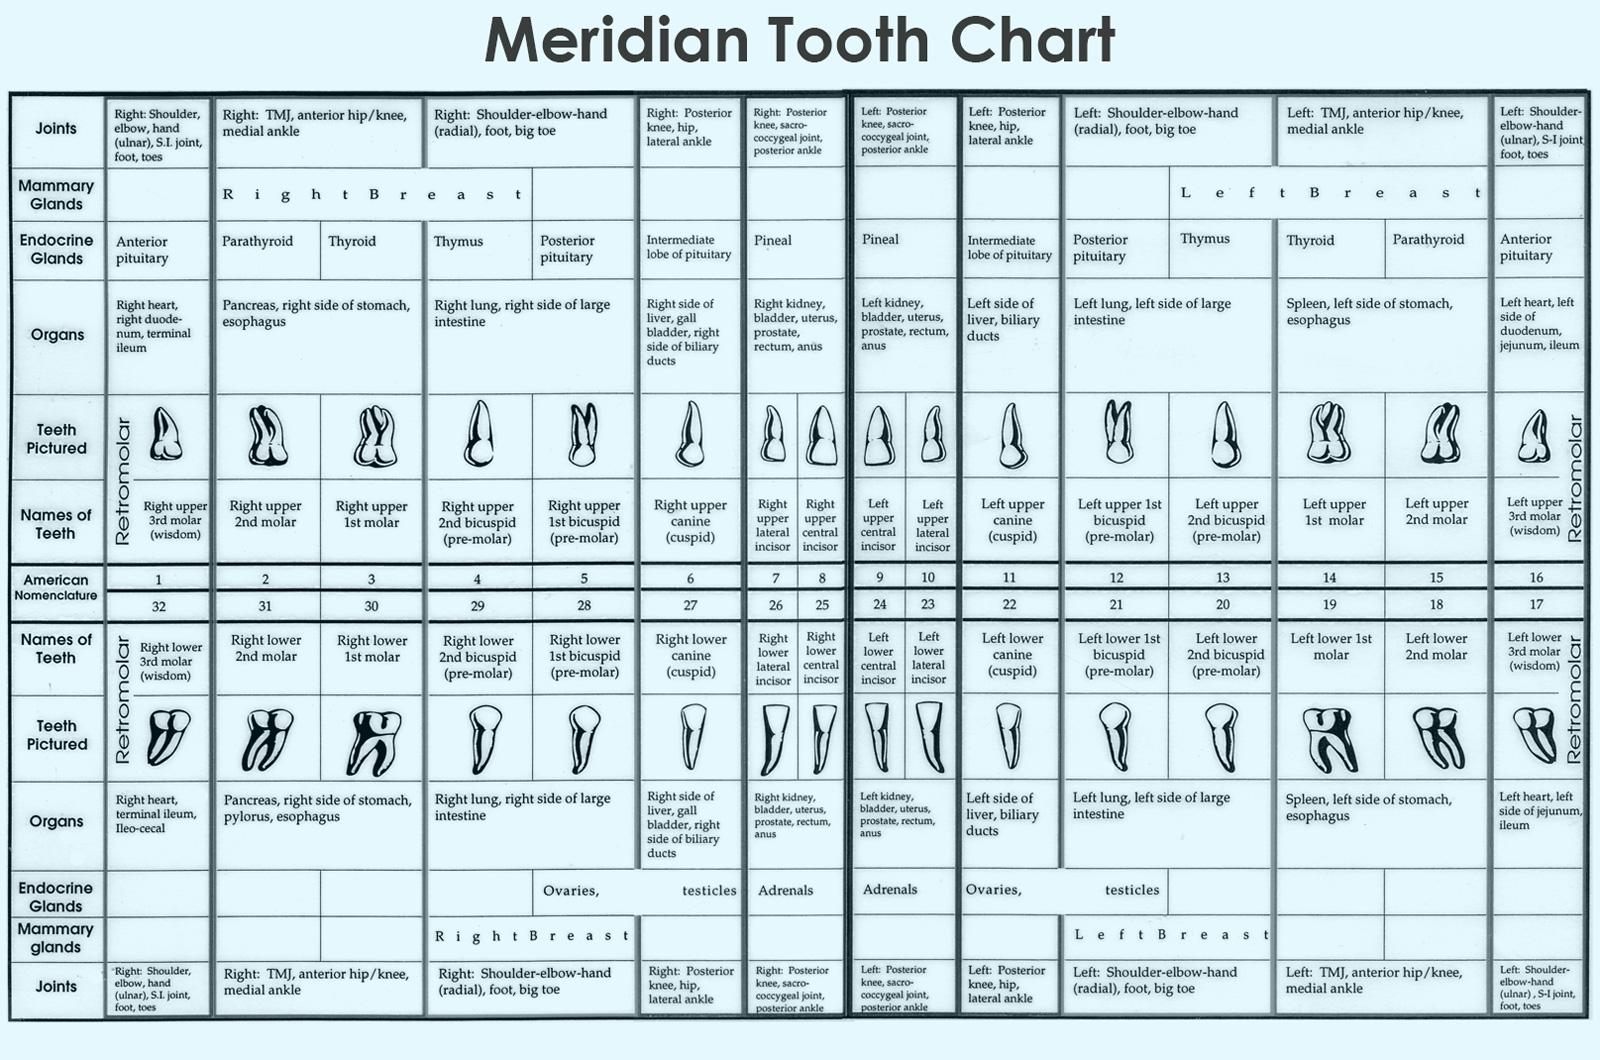 diagram of teeth and their numbers radial lighting circuit wiring understanding the meridian tooth chart